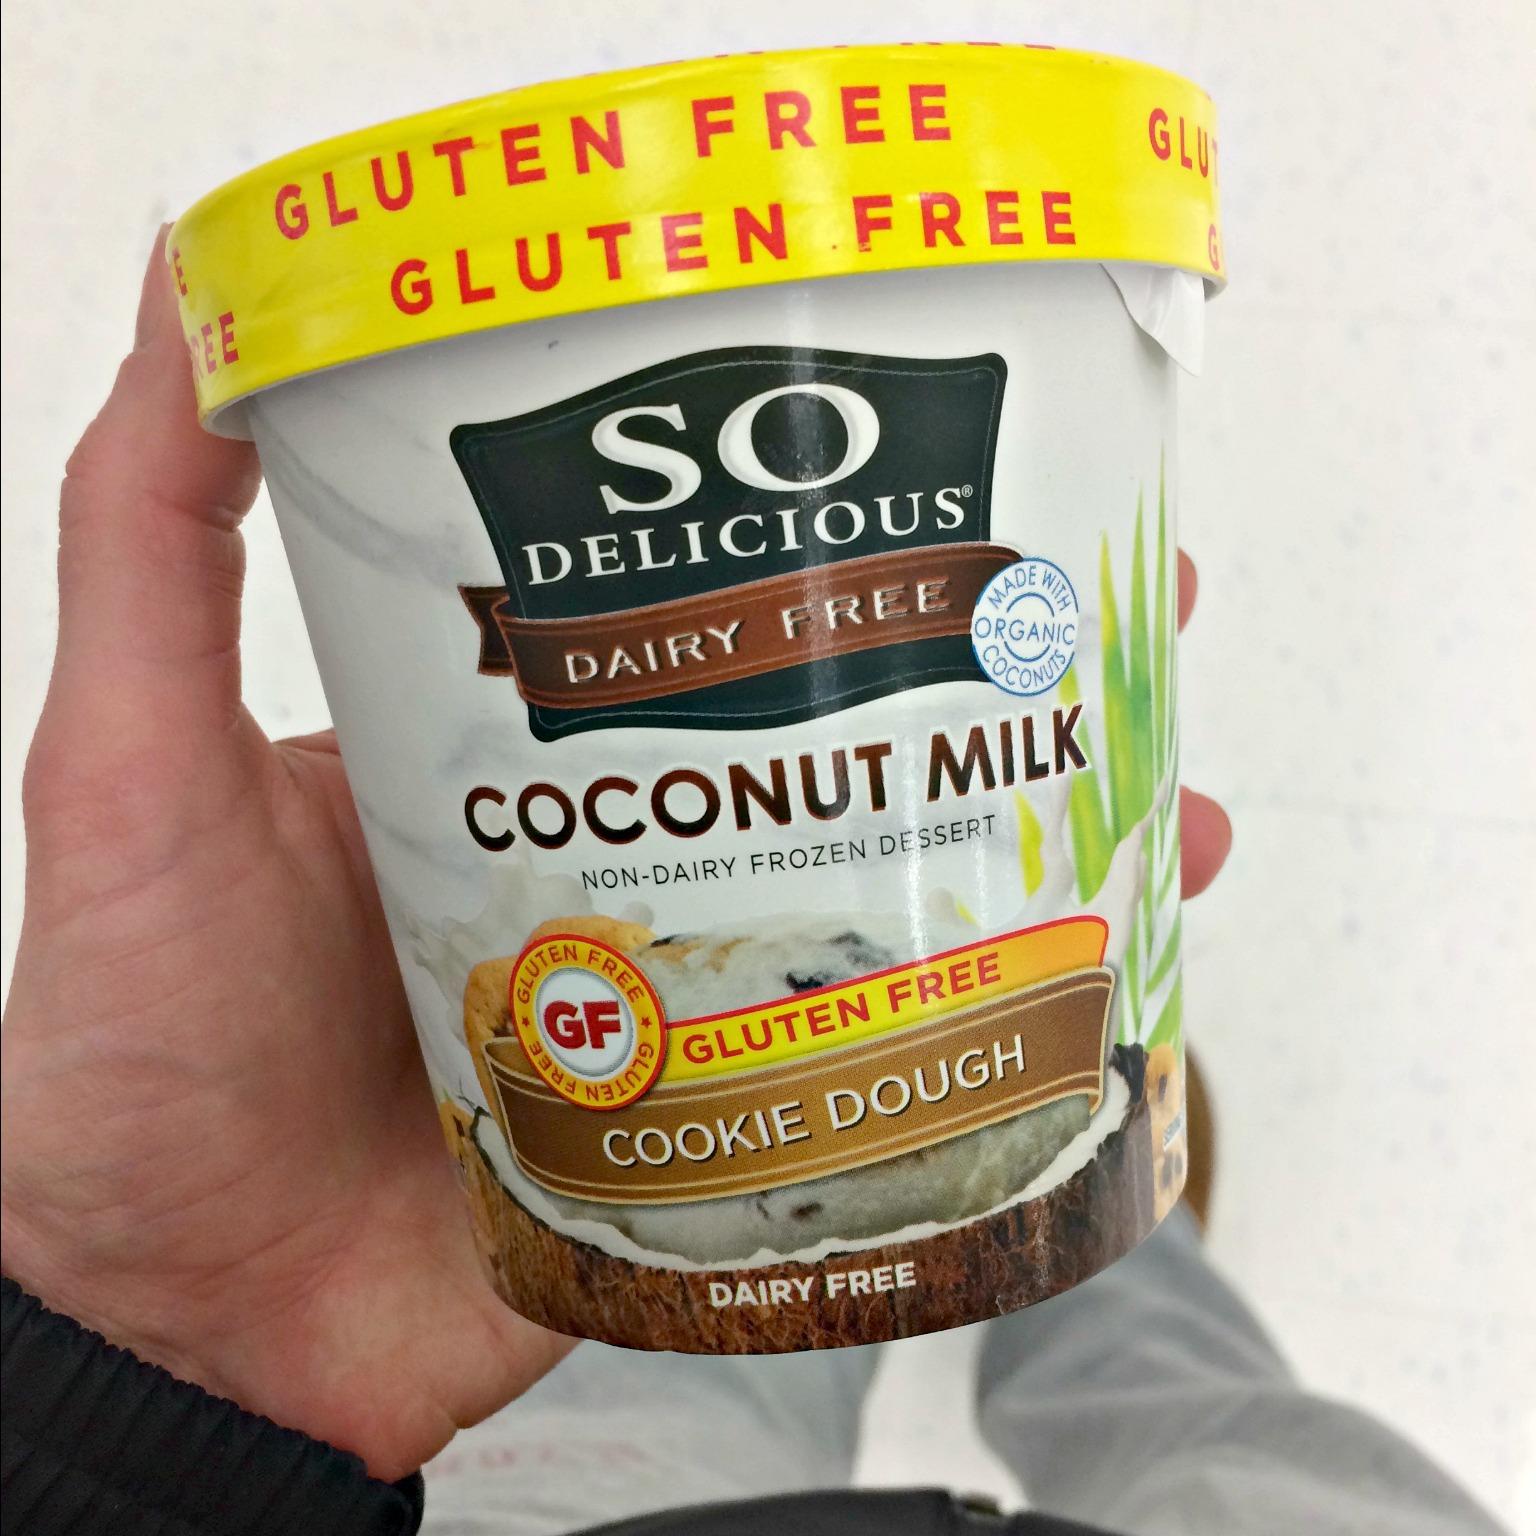 So Delicious Dairy Free Coconut Milk ice cream